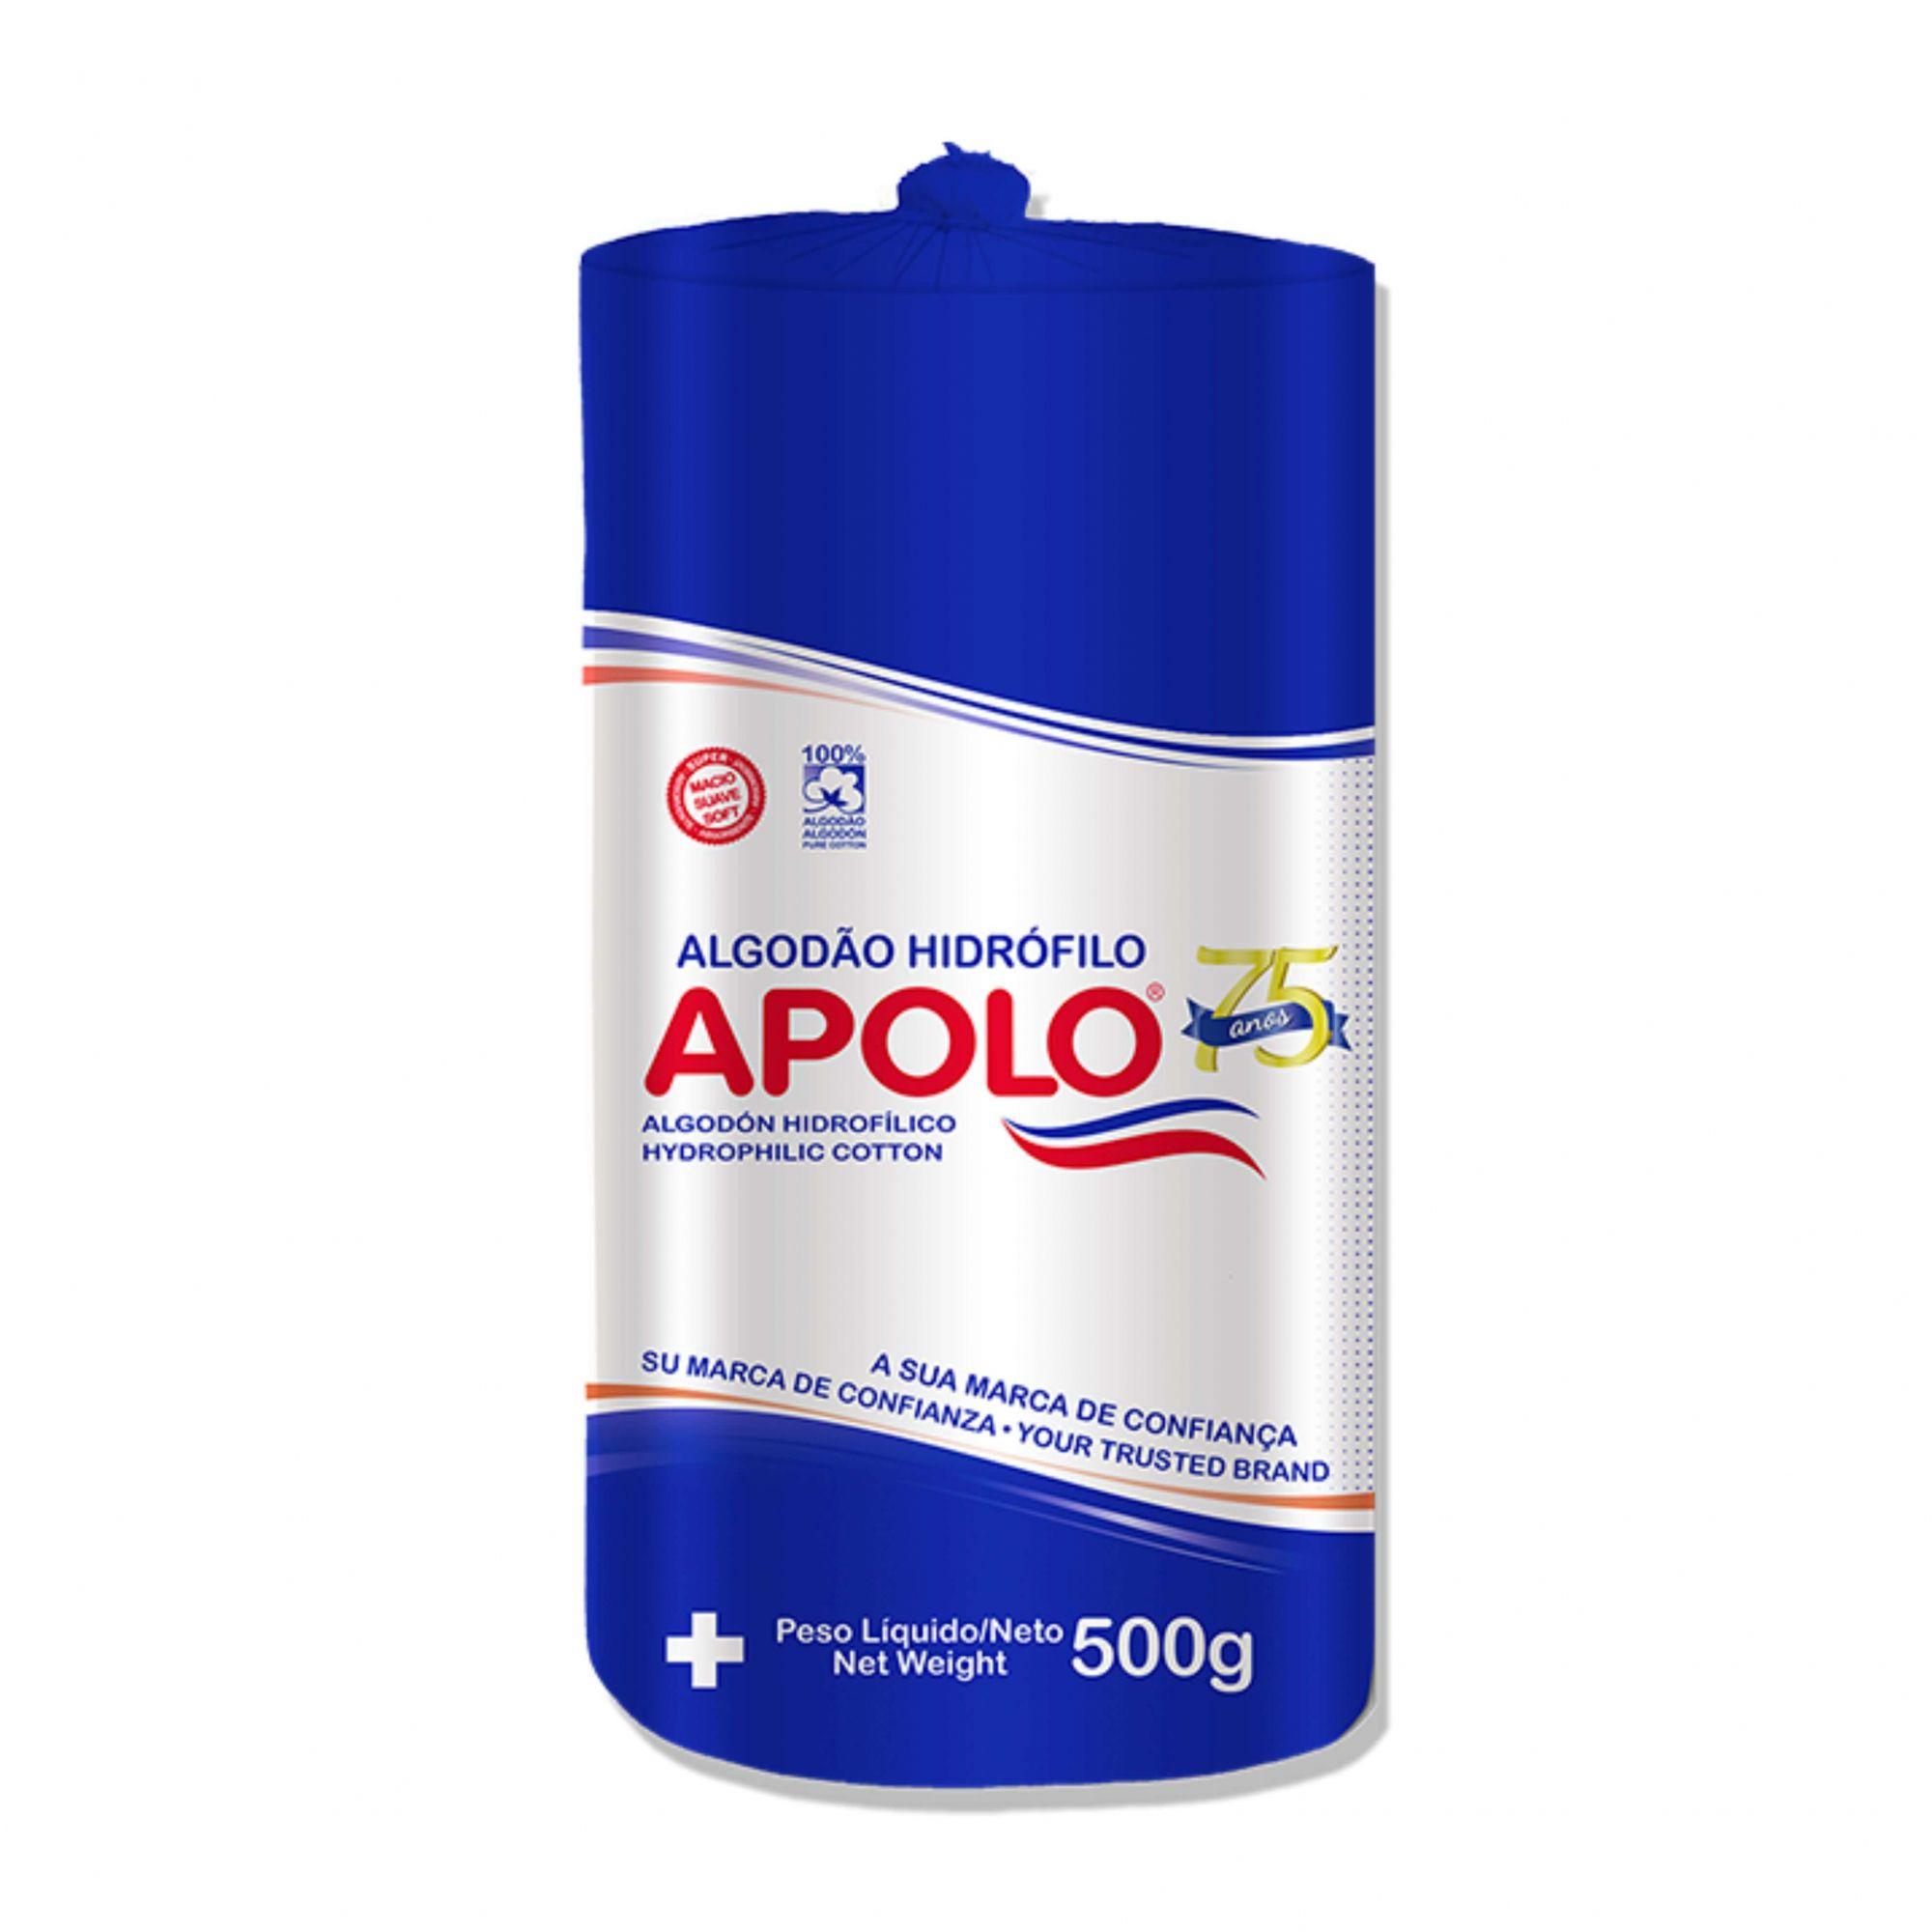 Algodao Apolo Rolo Hidrofilo 500g